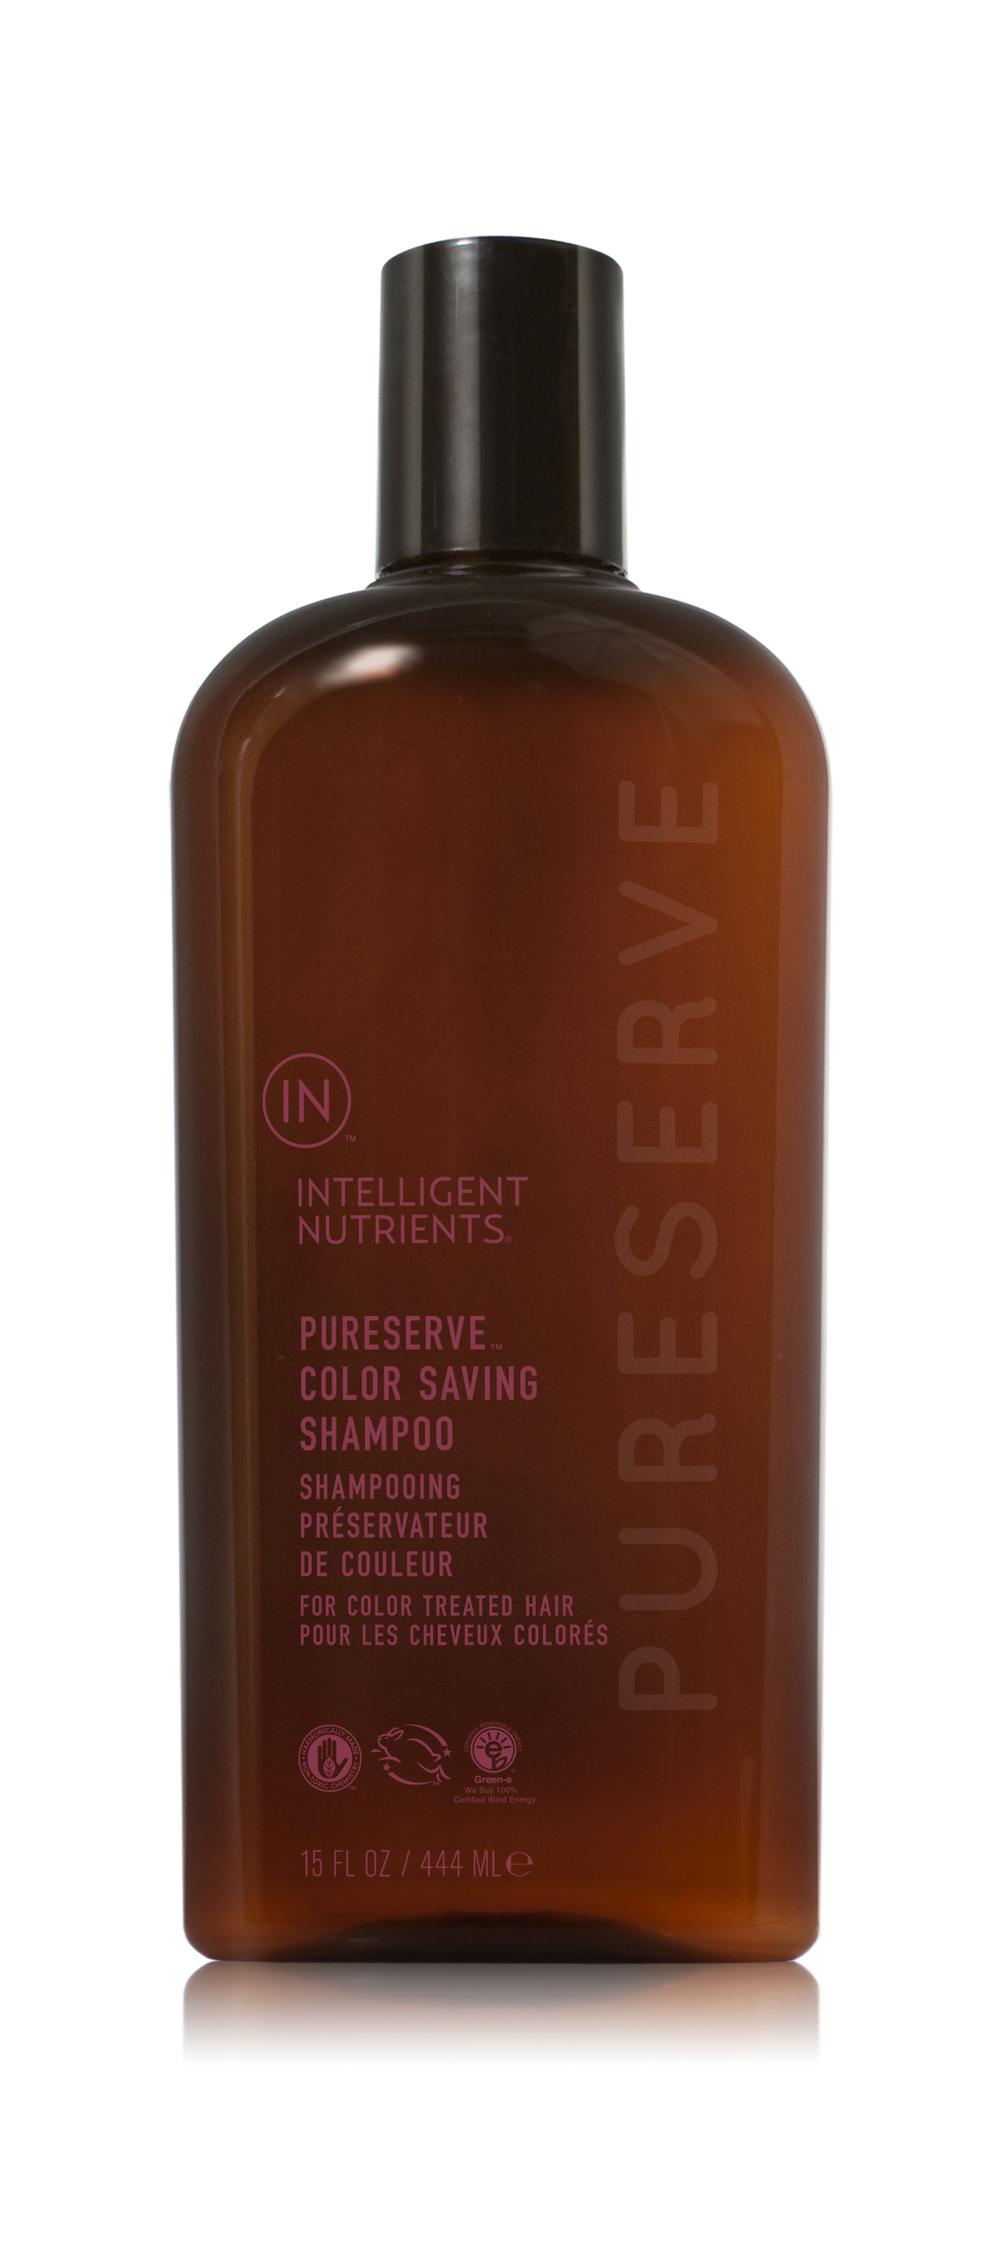 PureServe Shampoo (DKK380/444ml)